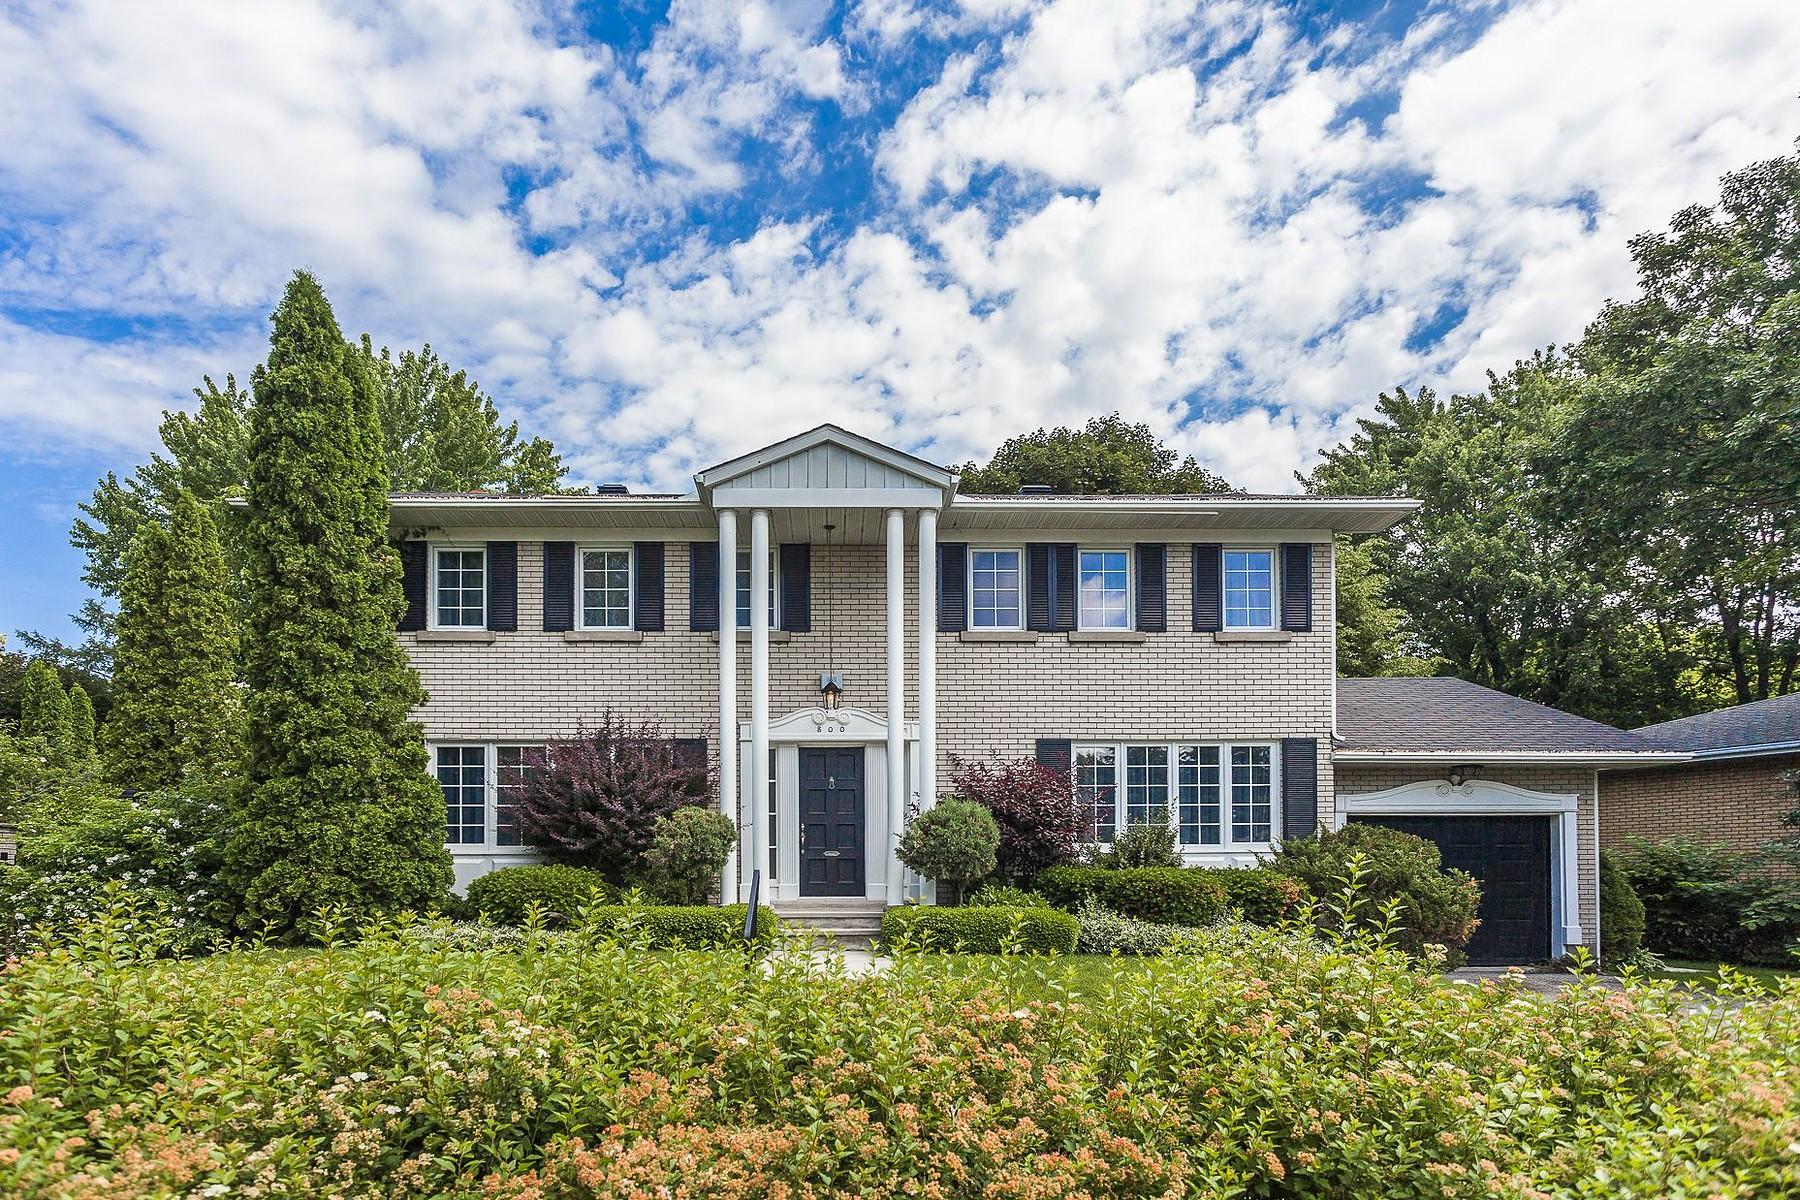 Villa per Vendita alle ore Two storey family residence 800 Boul. Houde Saint-Lambert, Quebec J4R1L9 Canada